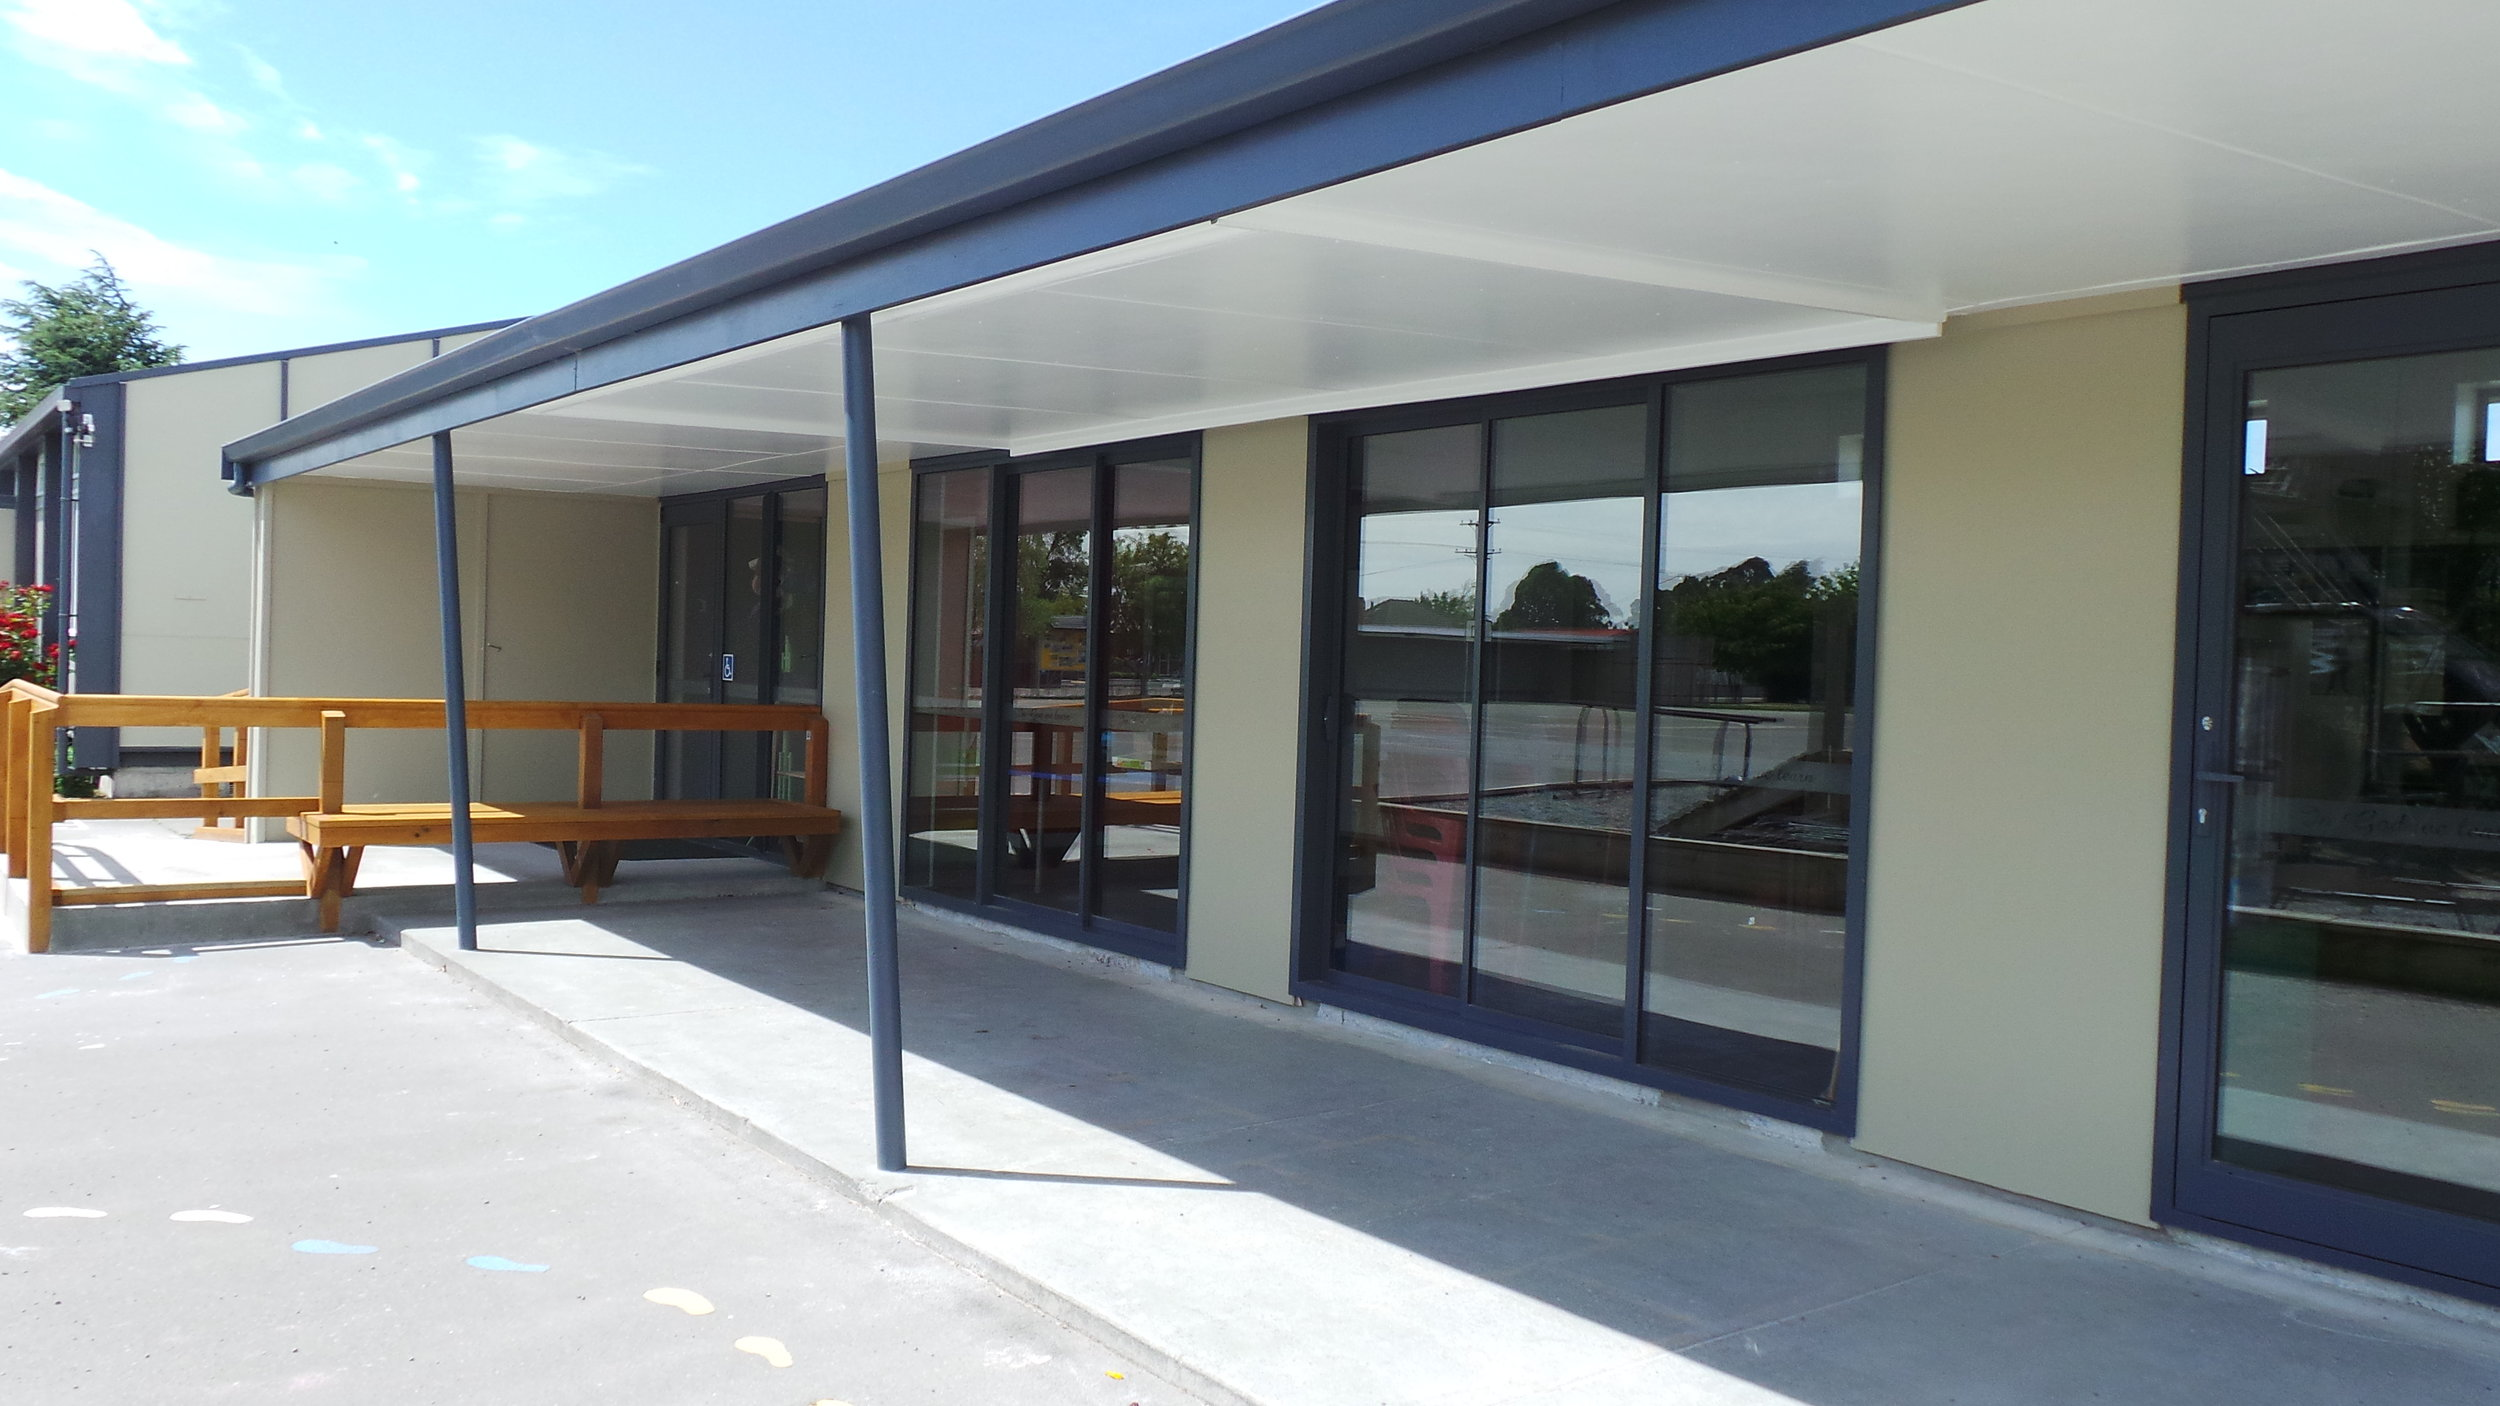 St Joseph's School, Temuka